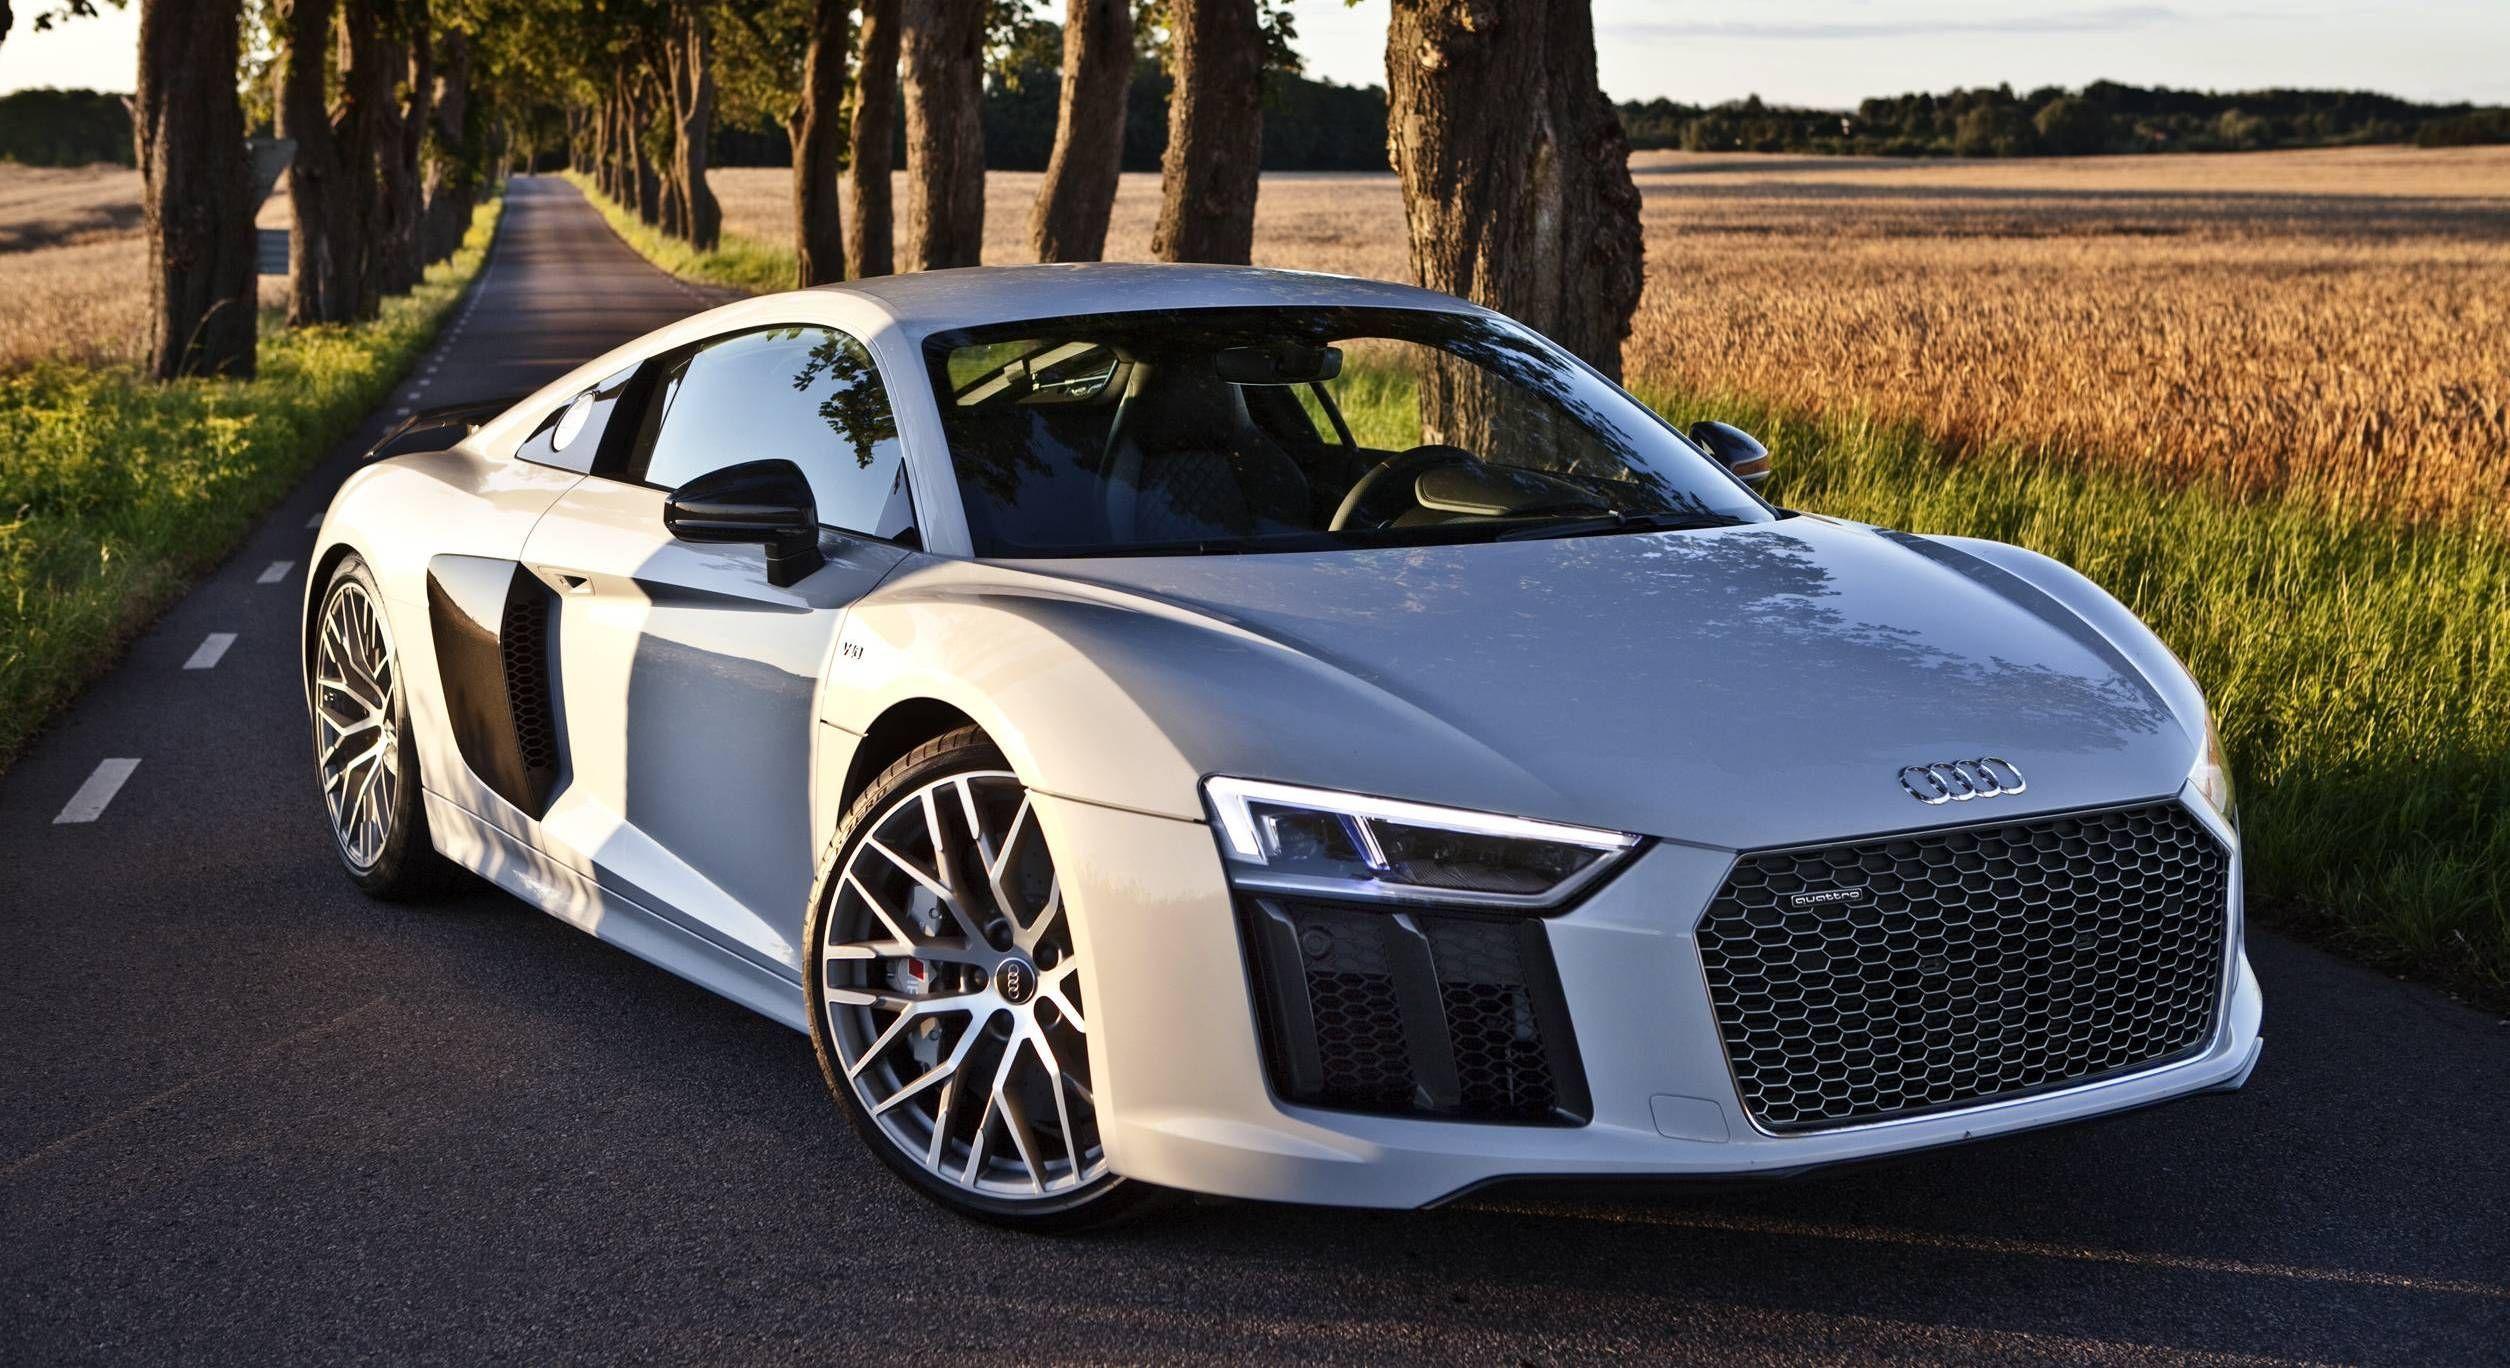 For More Details Audi Cars 2019 Information Visit Https Www Justcar Info Audi R8 V10 Plus Audi R8 V10 Audi R8 Convertible